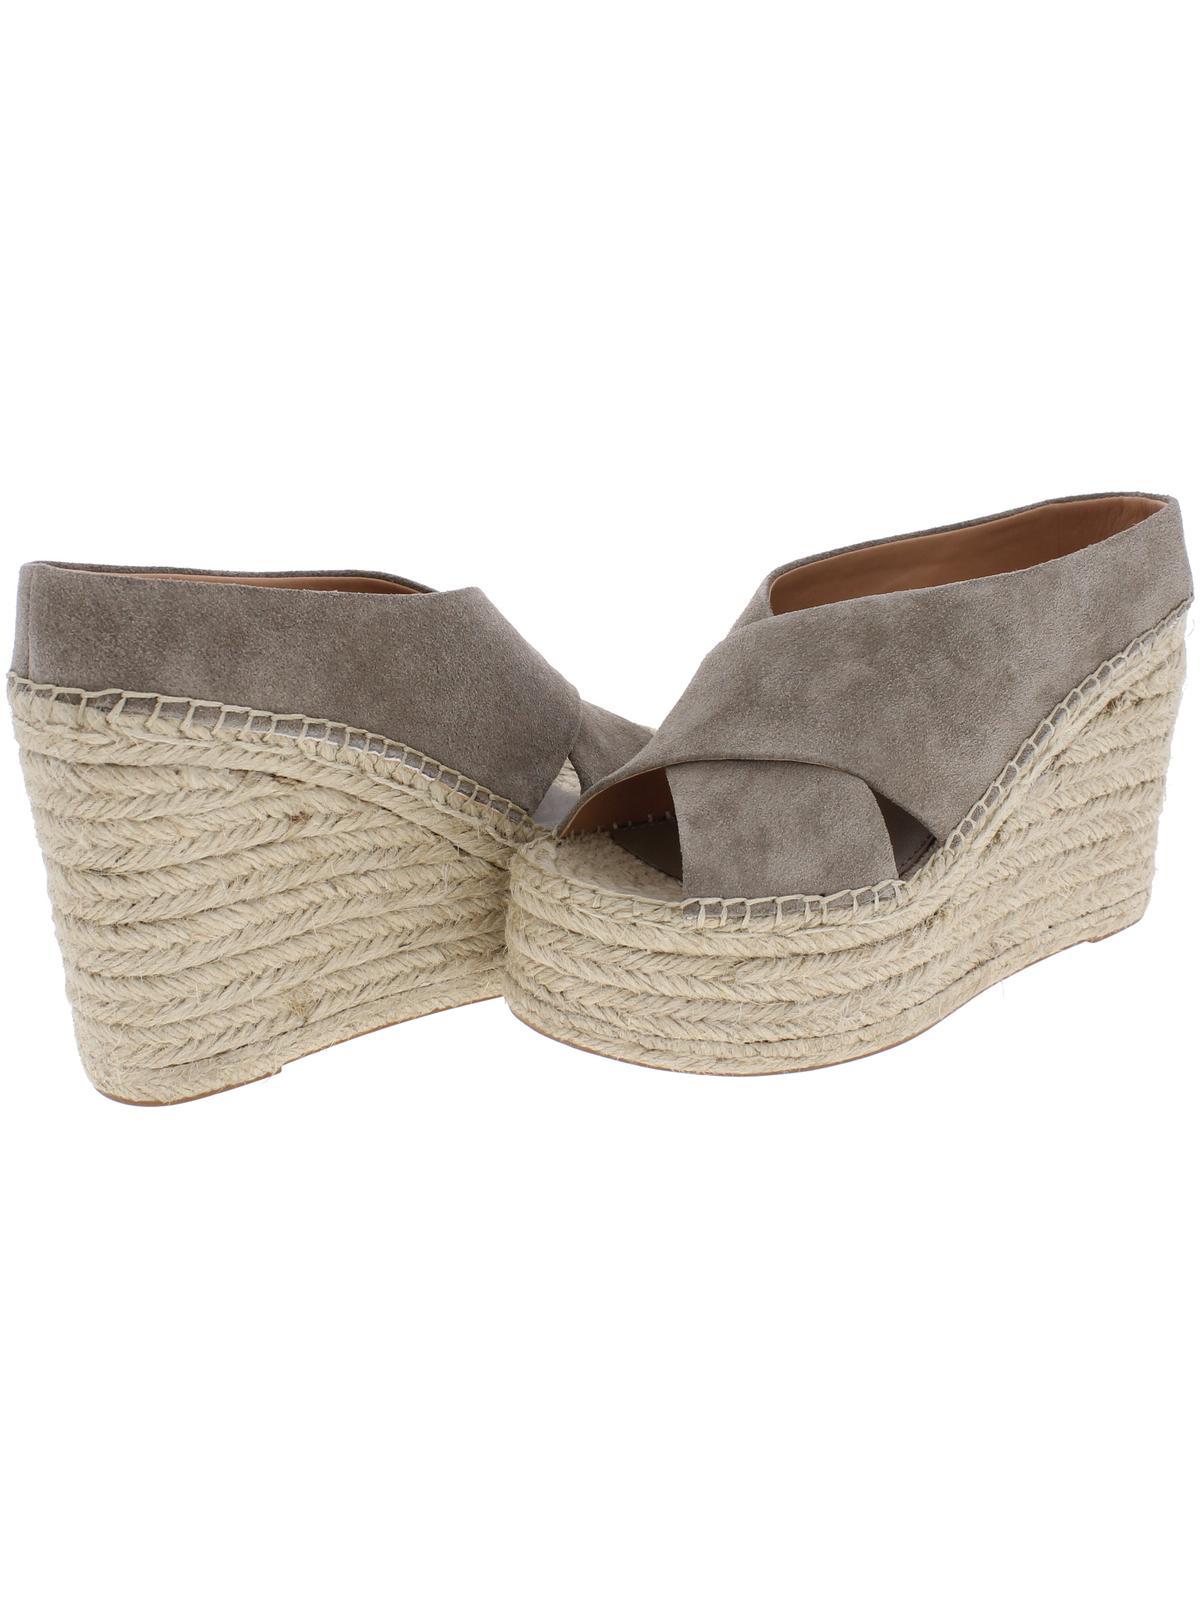 Sigerson Morrison Womens Atifa Suede Sandals Espadrille Wedge Sandals Suede 4450a9